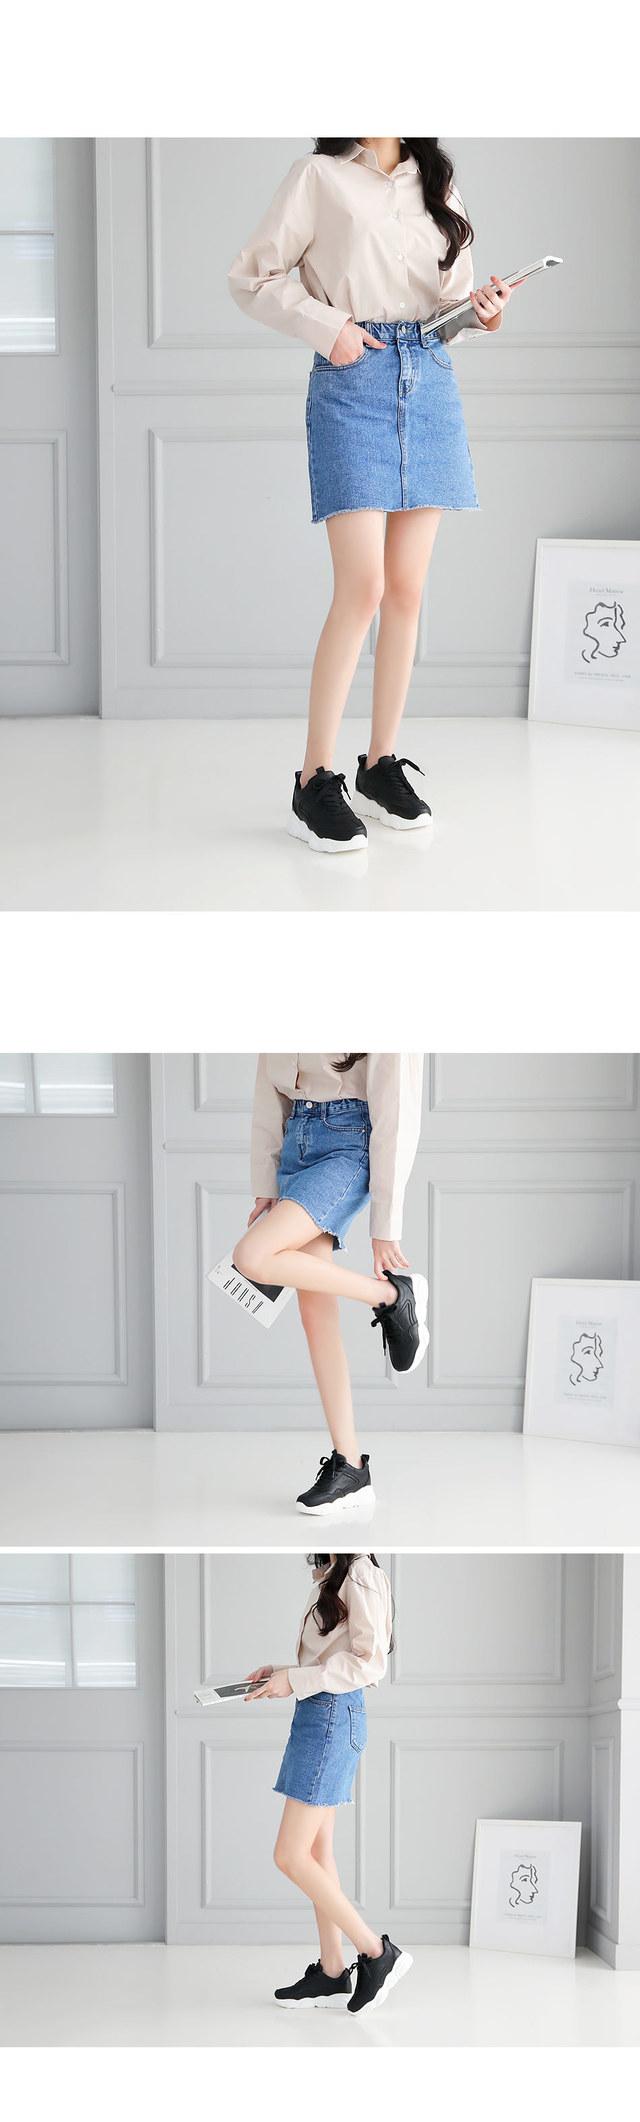 Bear sneakers 5cm